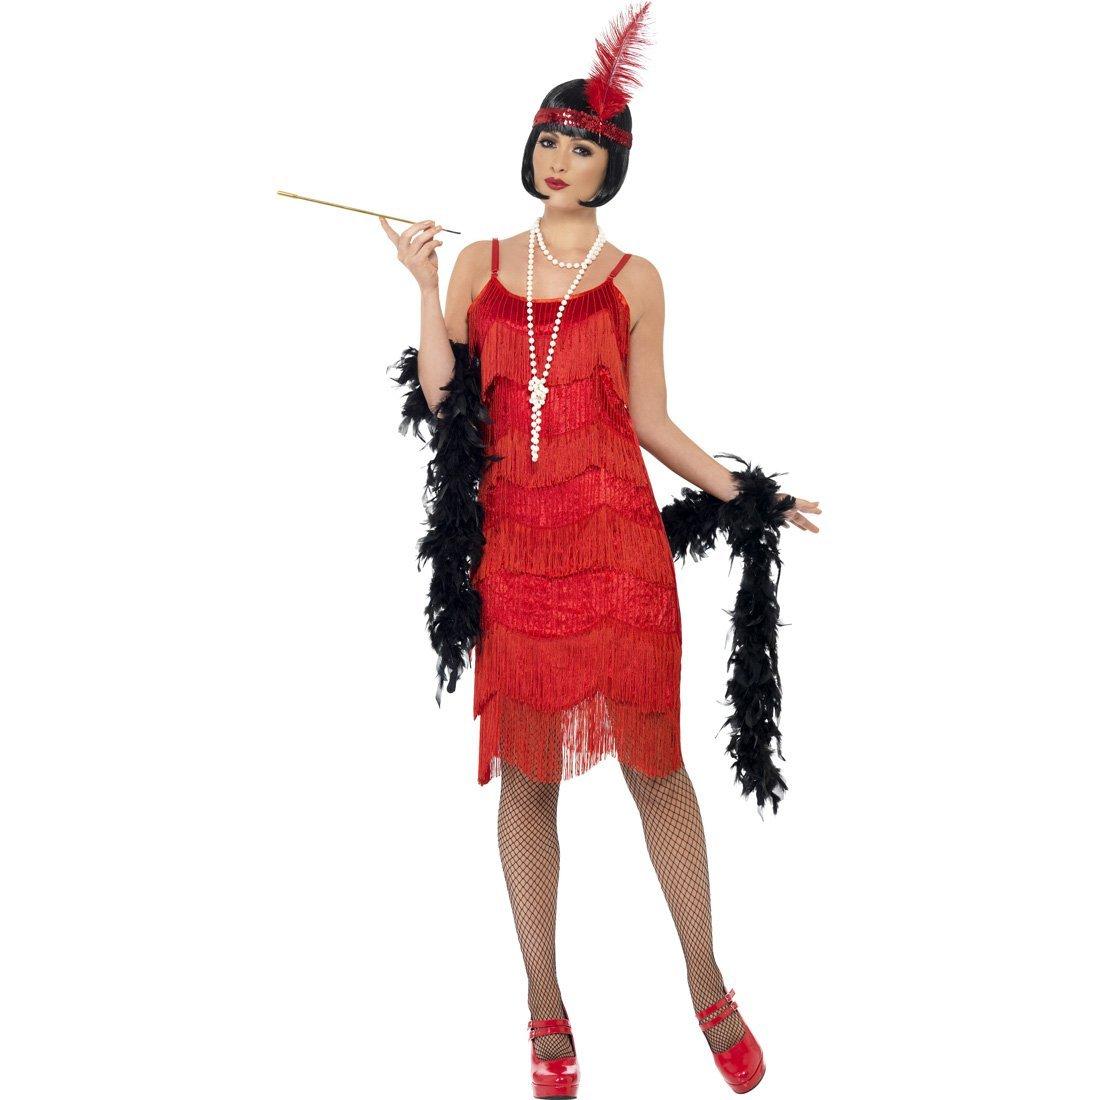 NET TOYS 23er Jahre Charleston Kostüm rot Fransenkleid S 36/38 Flapperkostüm Flapperkleid Flapper Kleid Charlestonkleid